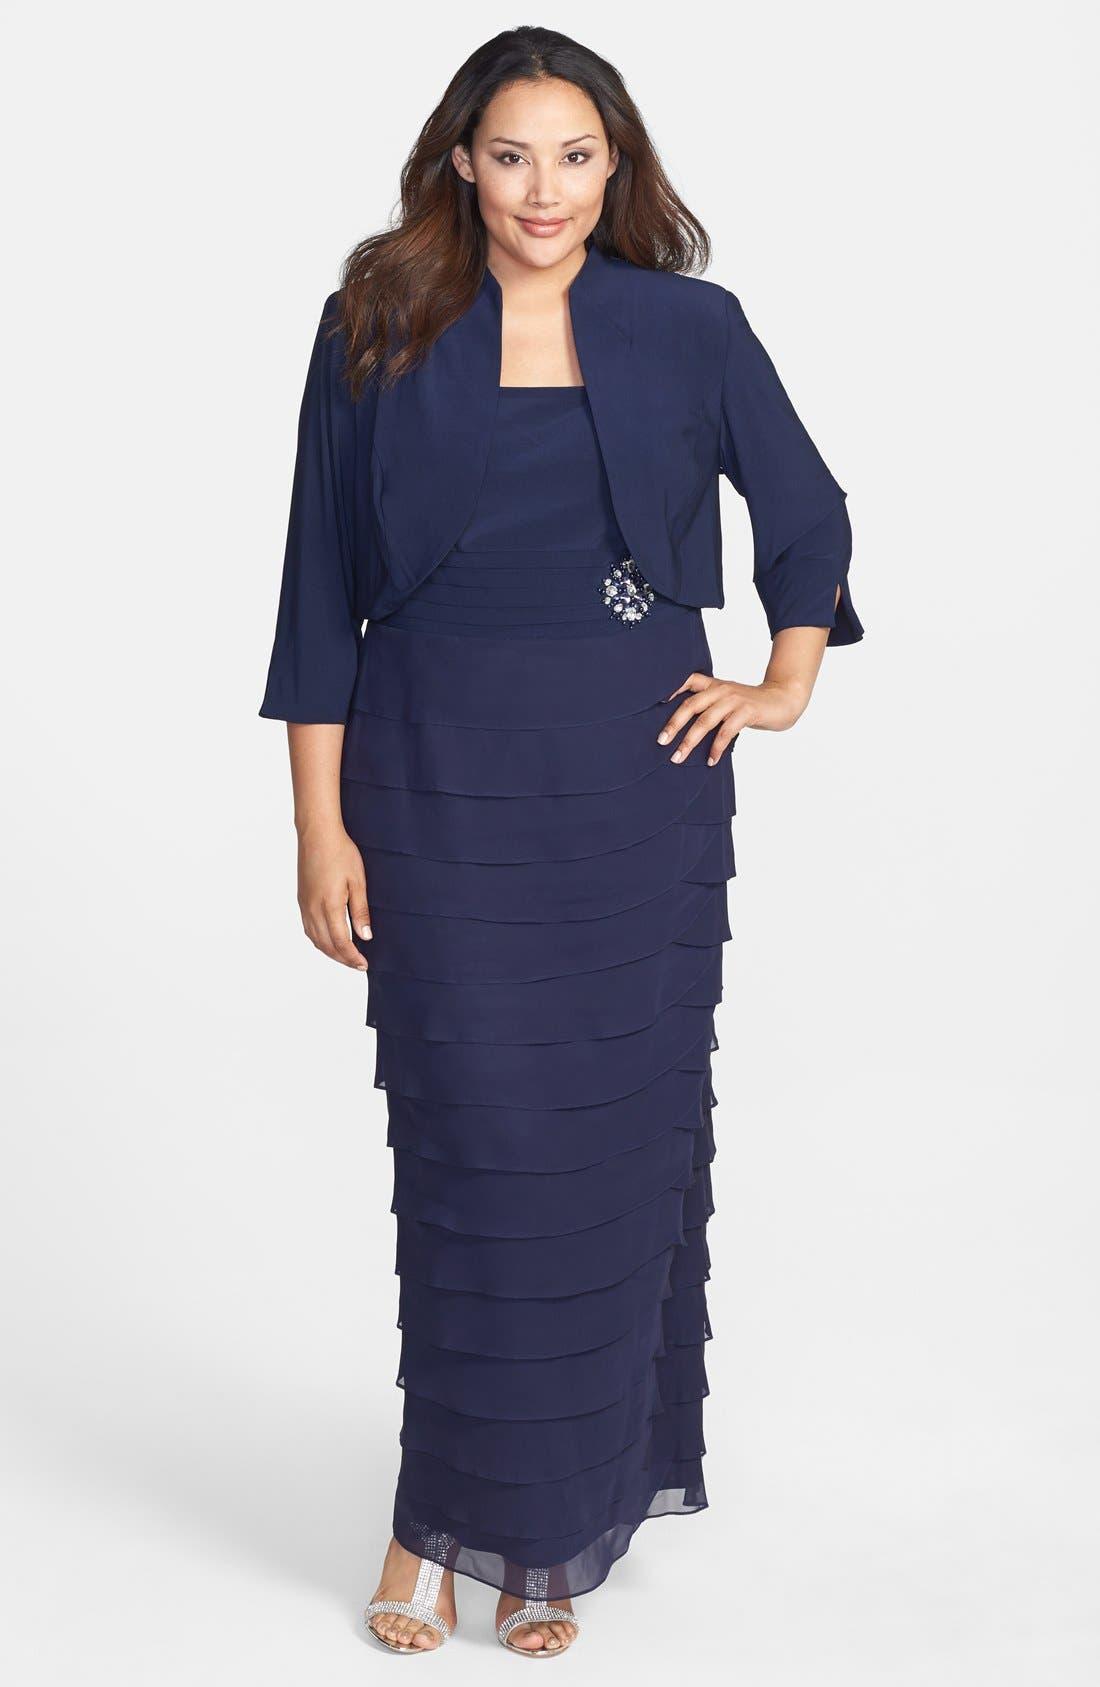 Alternate Image 1 Selected - Jessica Howard Embellished Waist Artichoke Pleat Gown & Jacket (Plus Size)